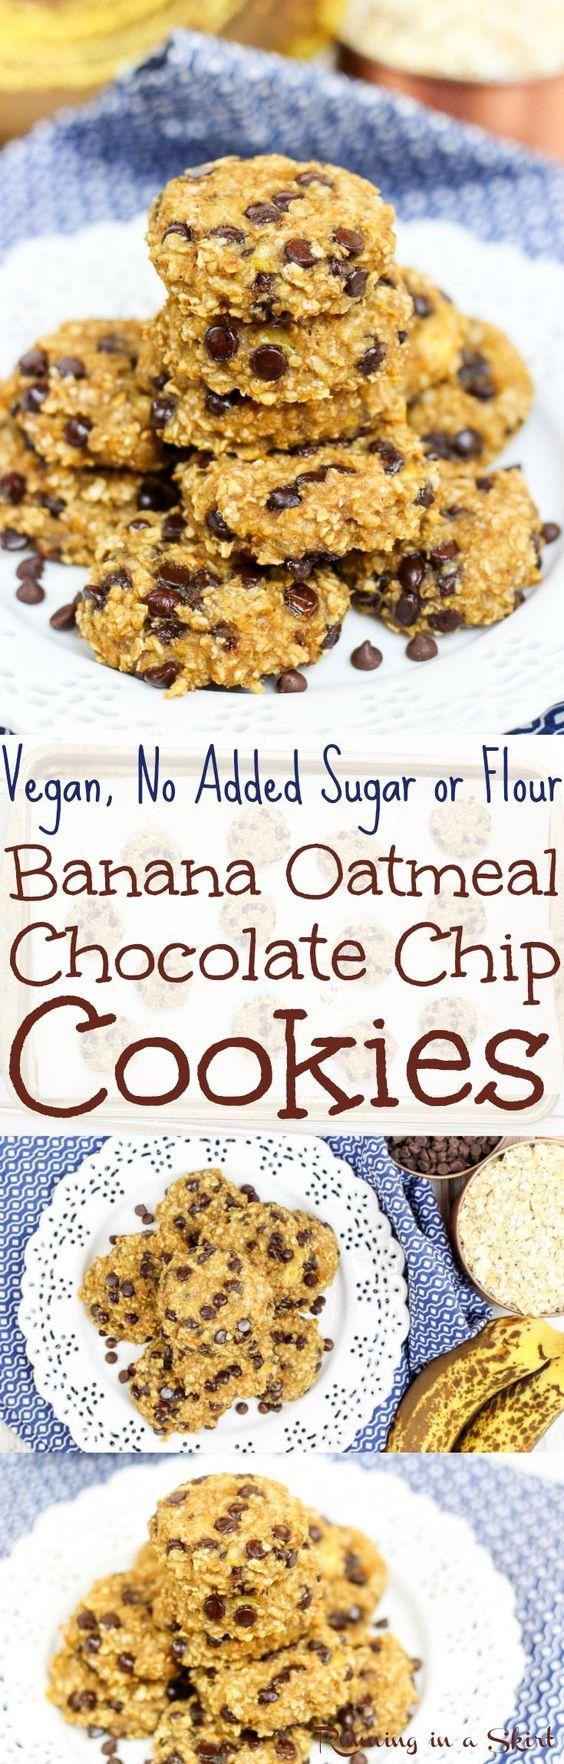 Oatmeal Chocolate Chip Cookies recipe. Vegan, eggs free, dairy-free ...